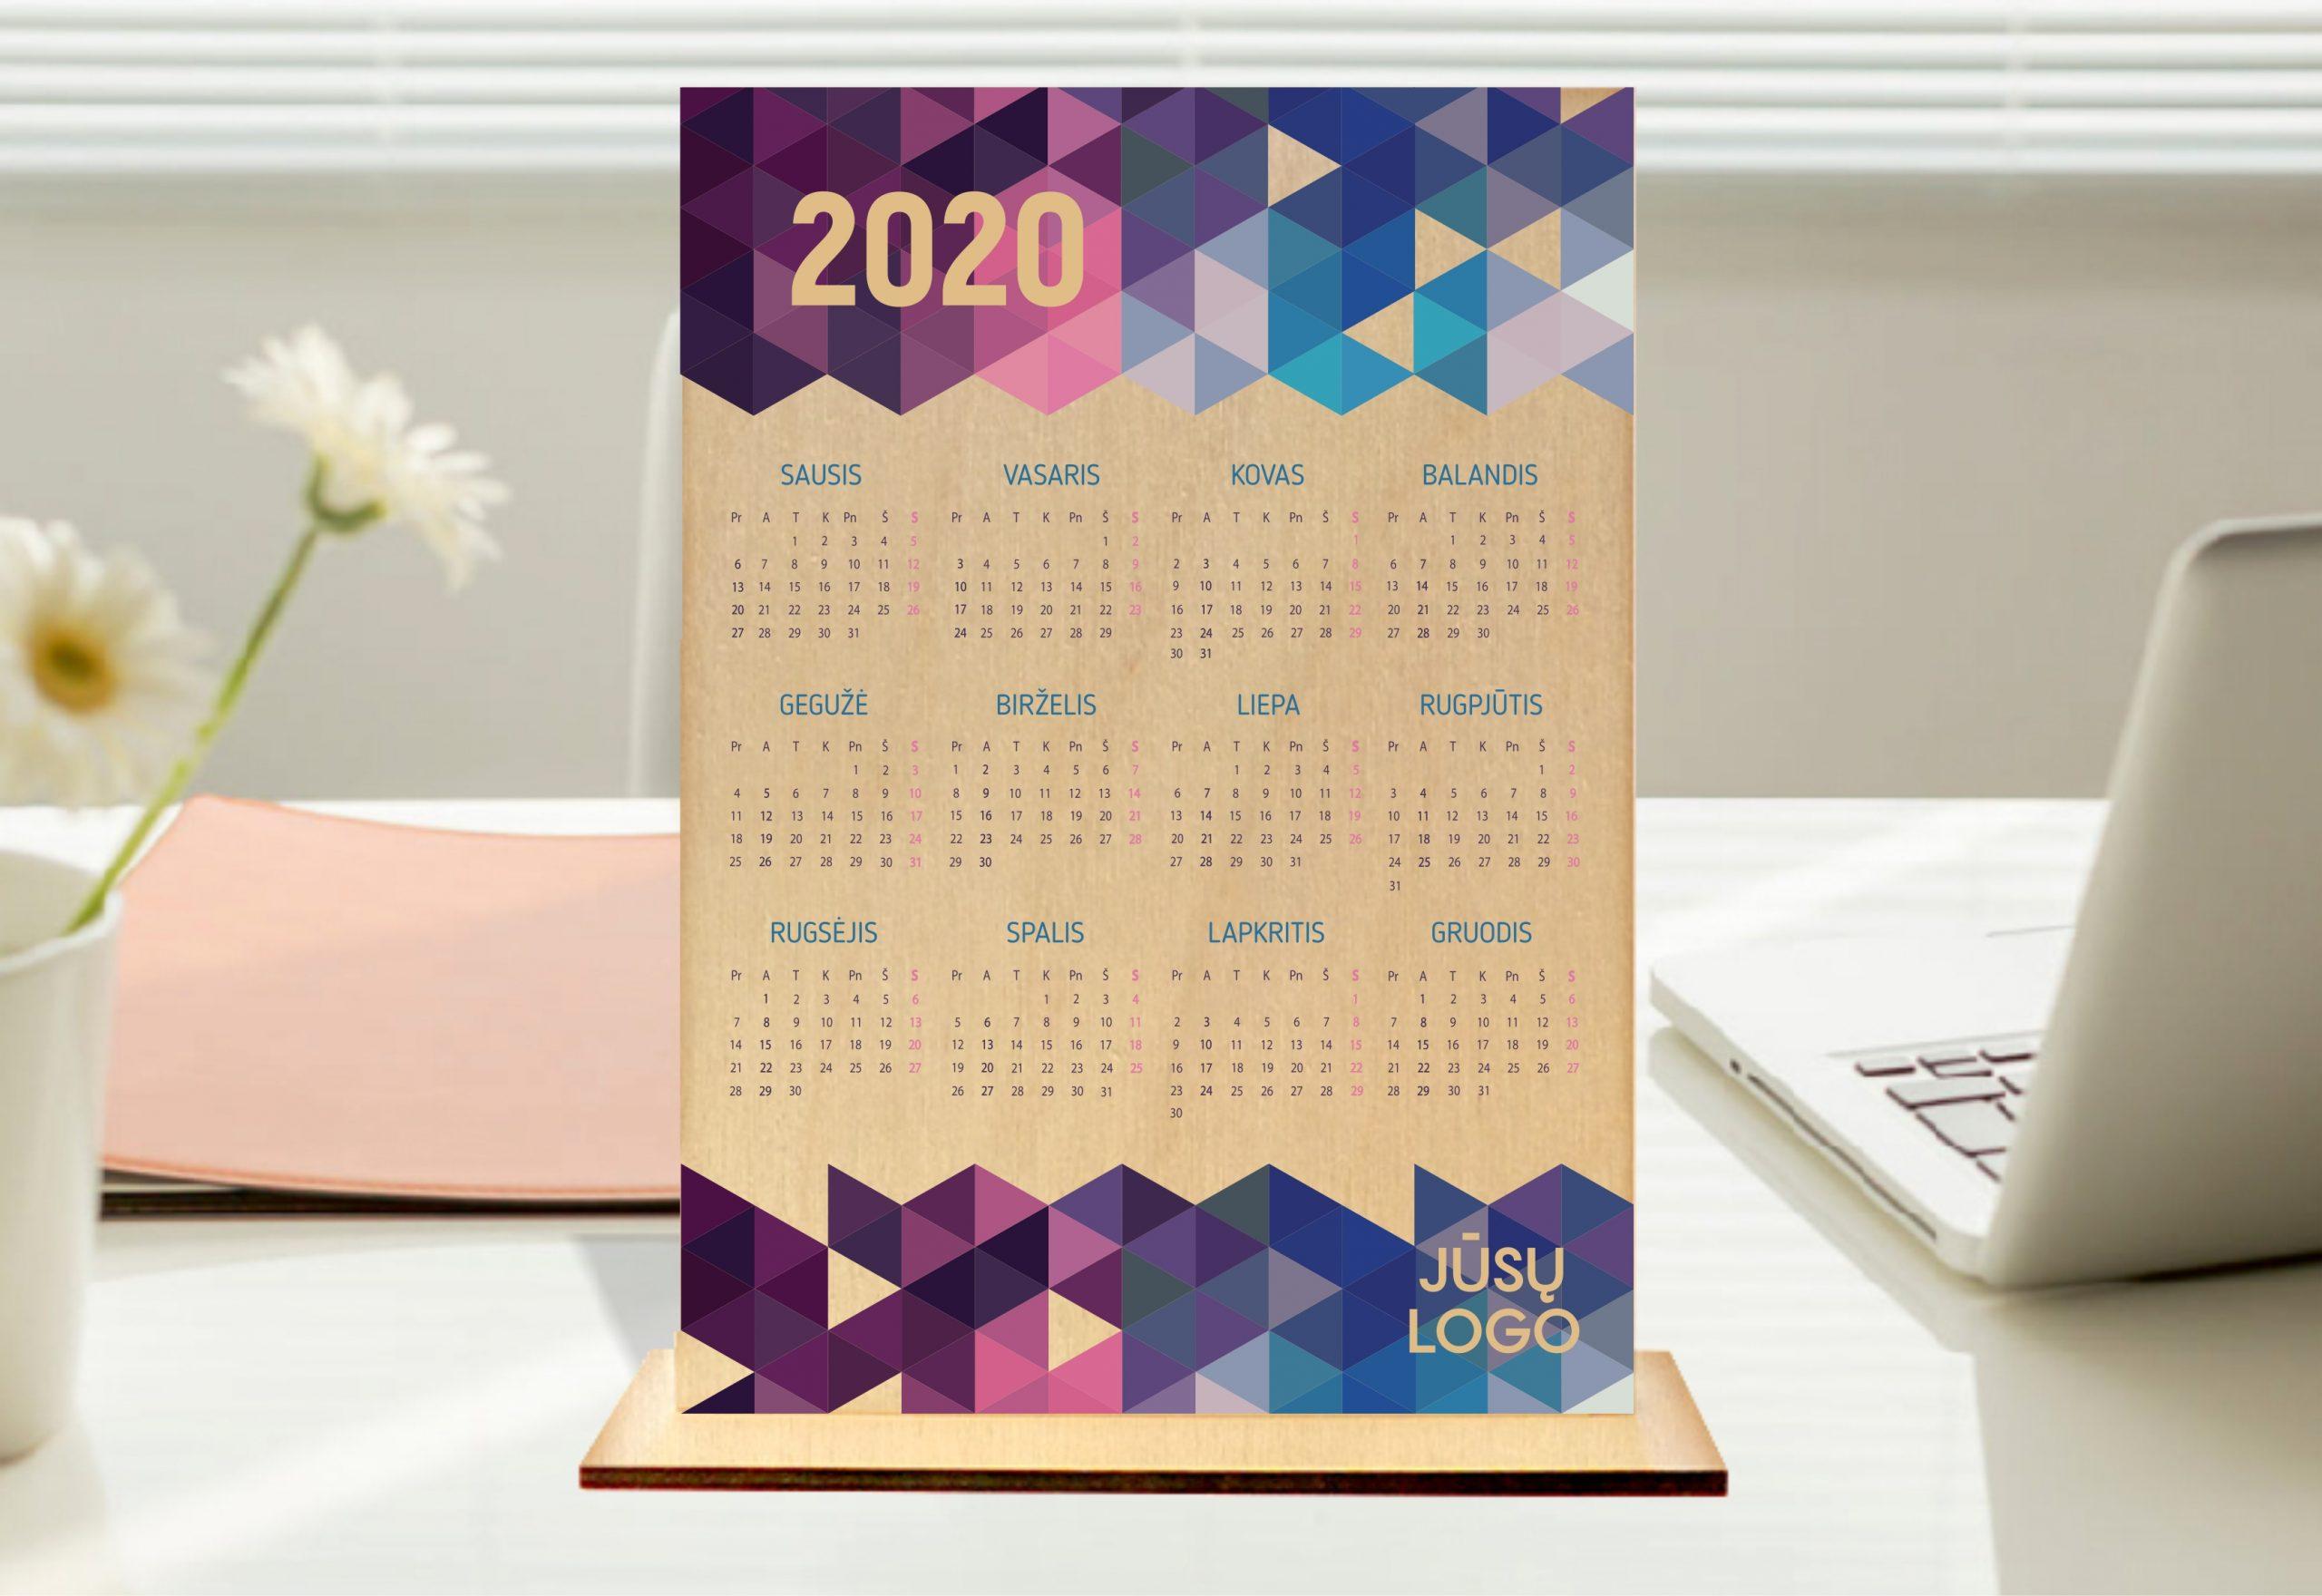 2020 metų kalendorius, kalendorisu su logotipu